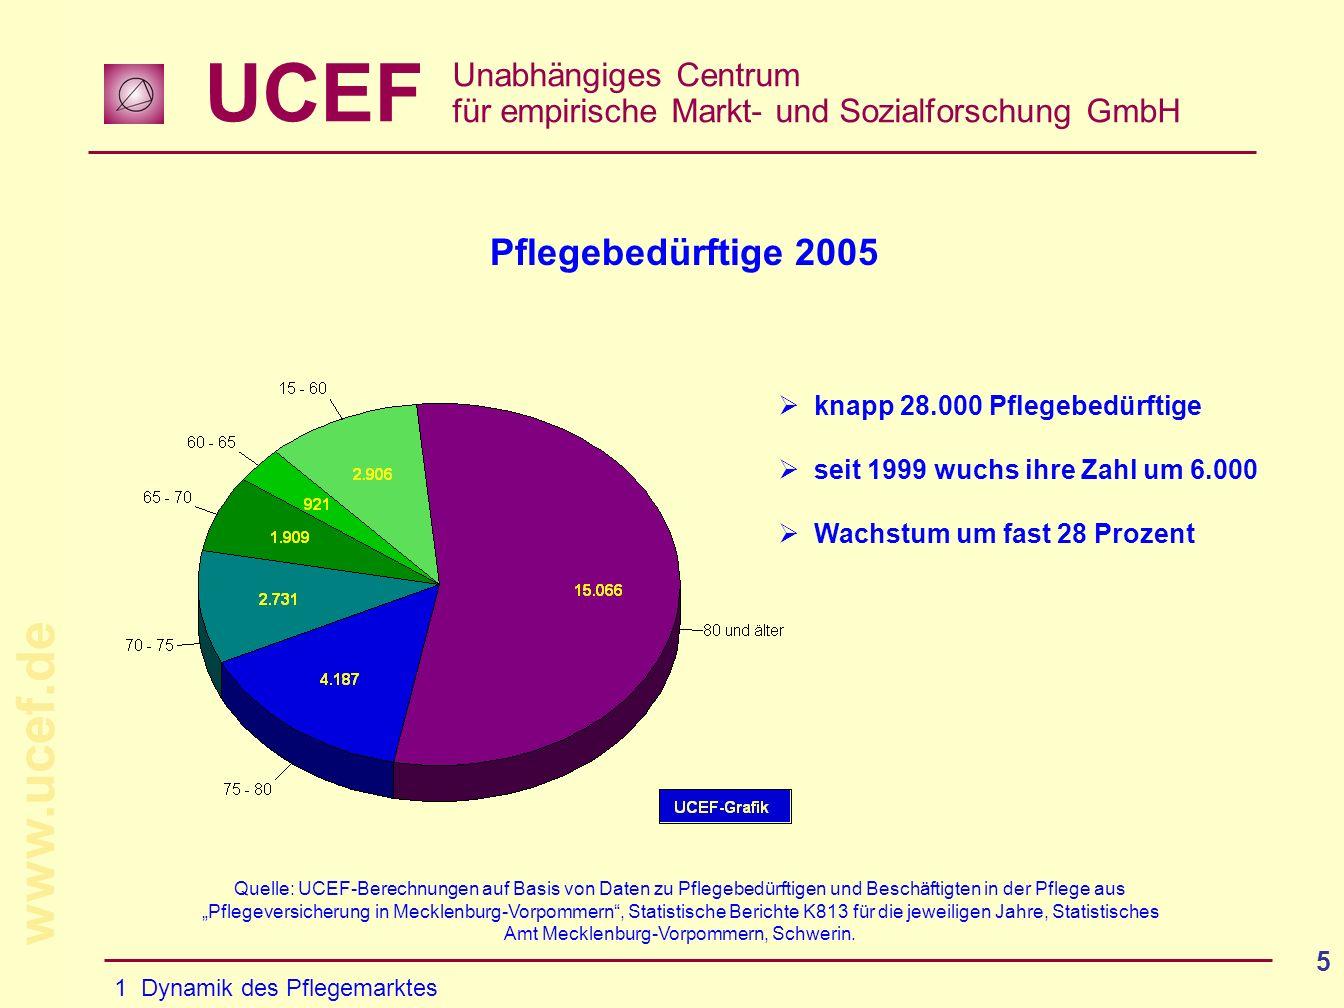 Pflegebedürftige 2005 knapp 28.000 Pflegebedürftige